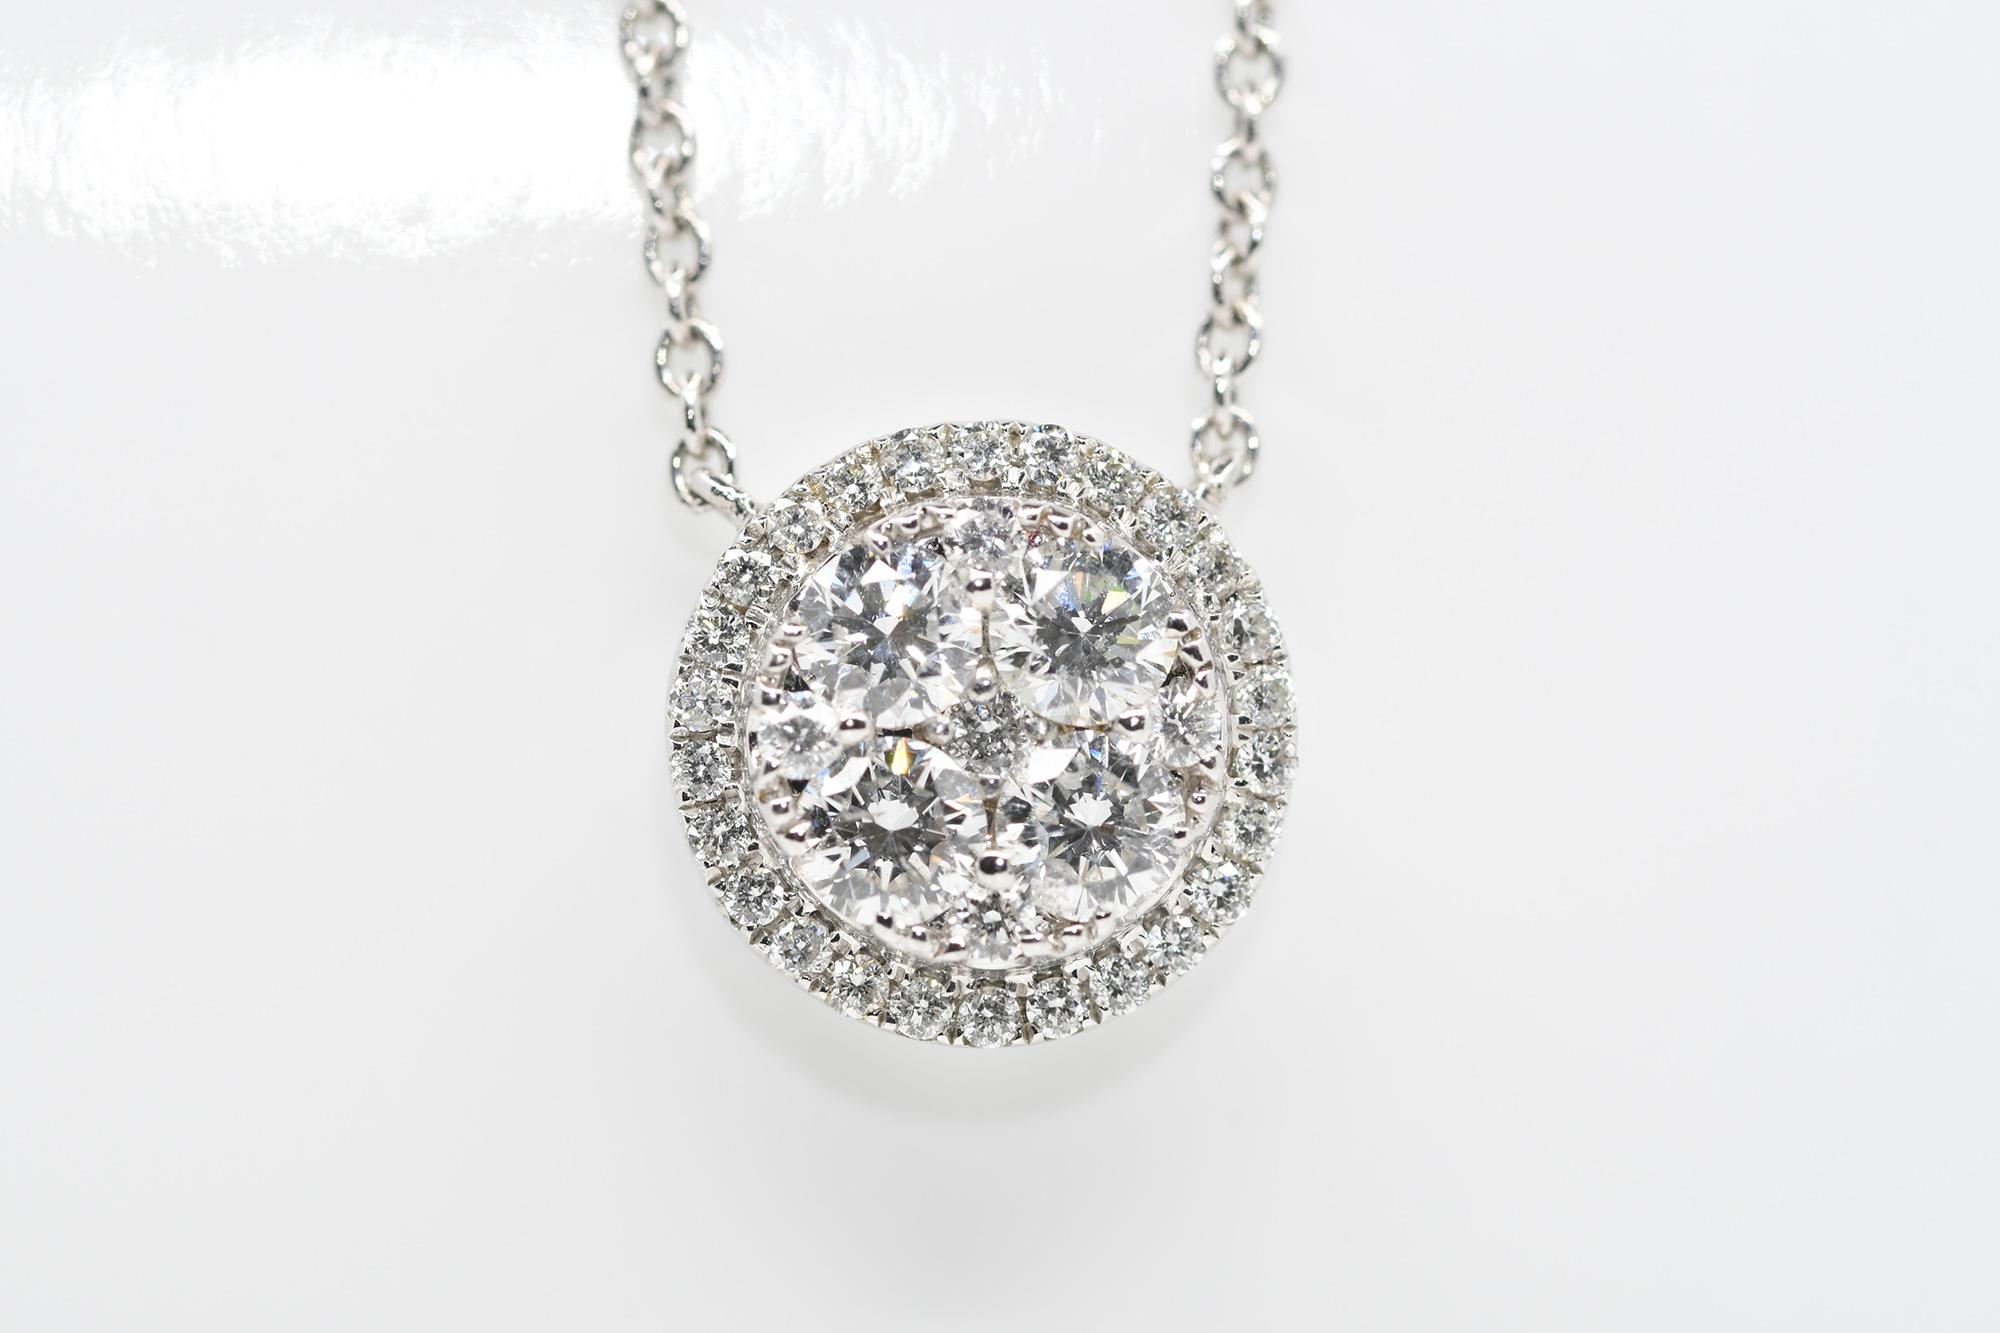 Diamond Pendant - Image 2 of 3